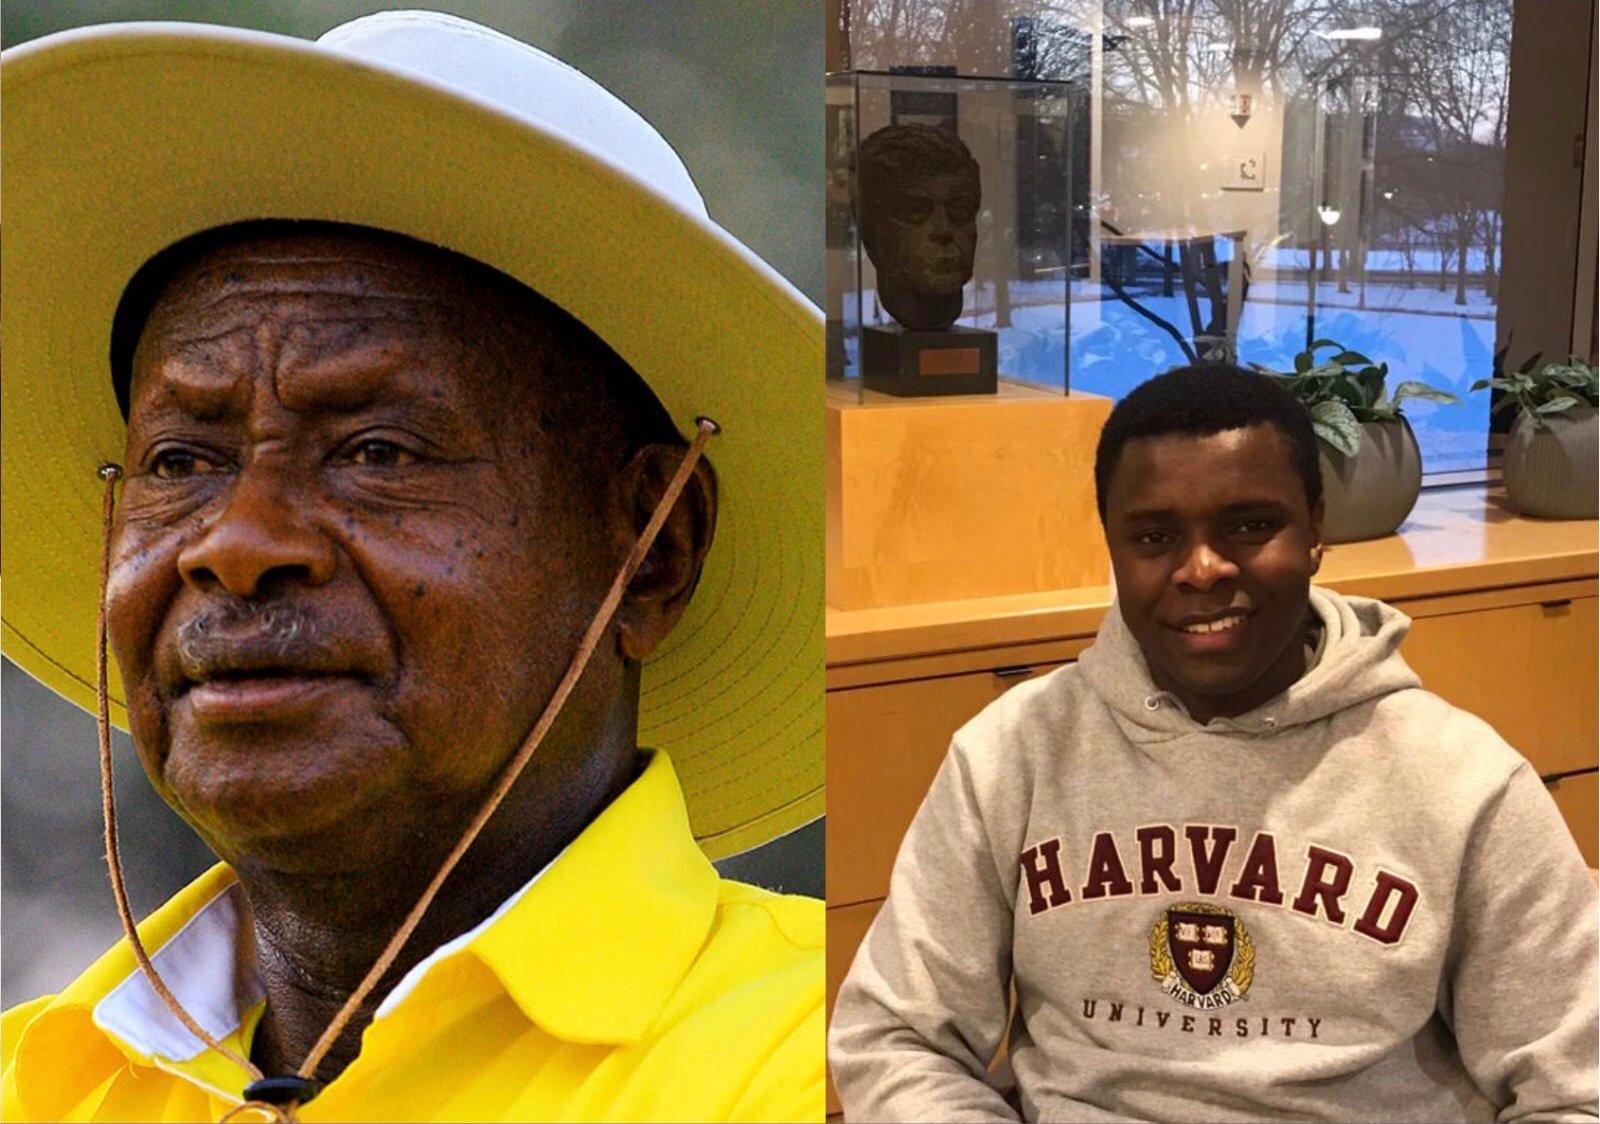 5d666d772344a - Harvard Student Sues Ugandan President For Blcoking Him On Social Media